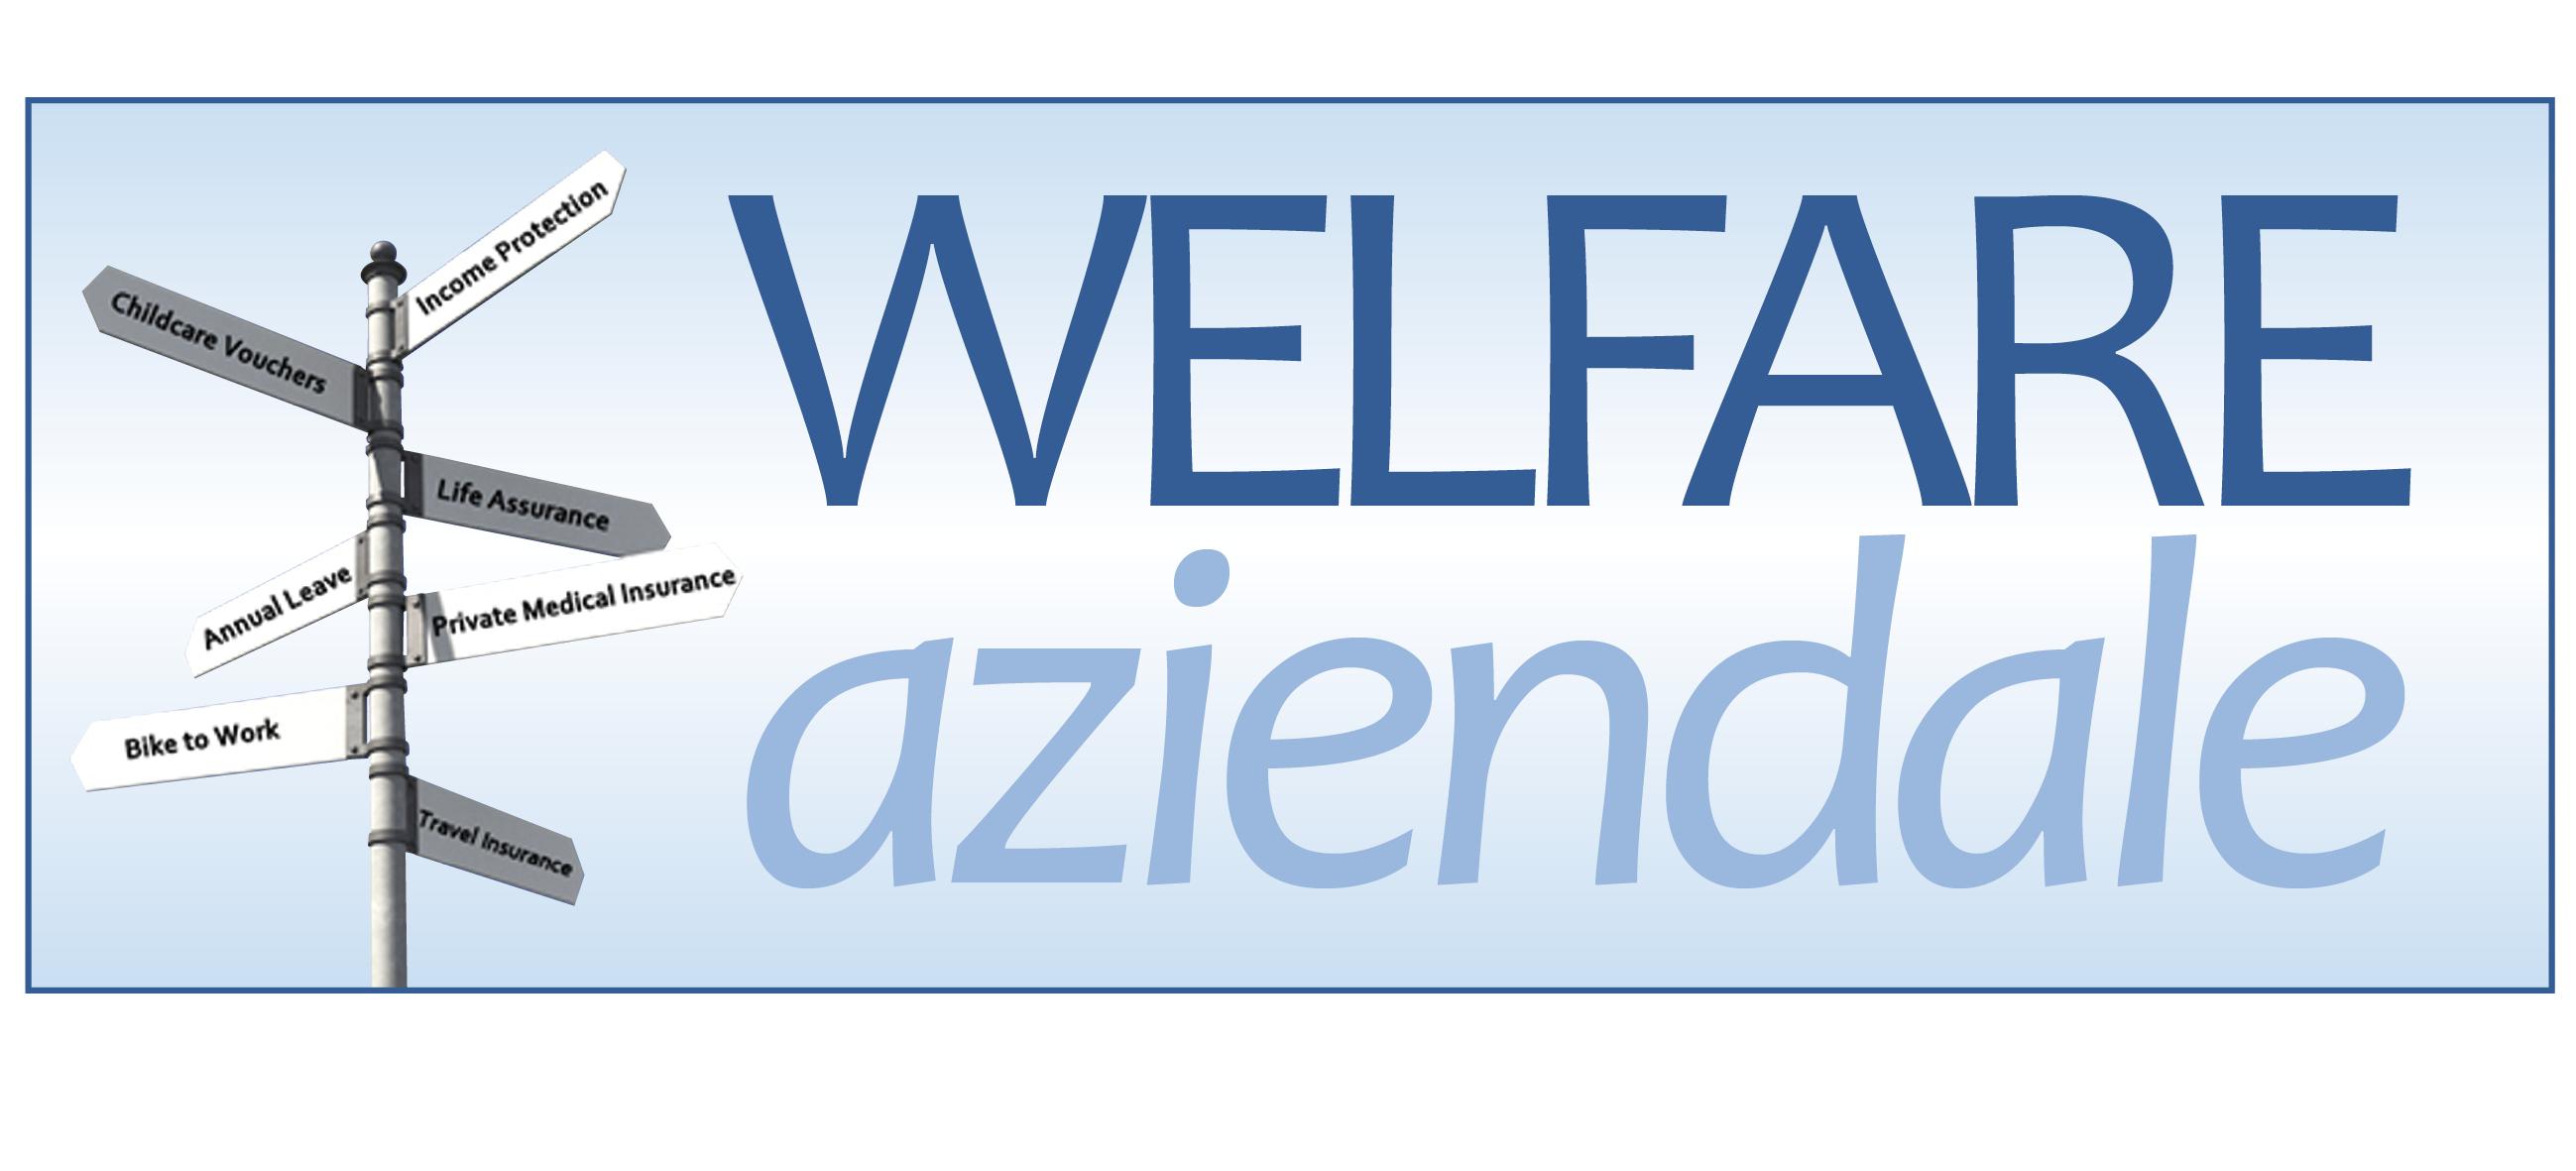 Welfare e Counseling